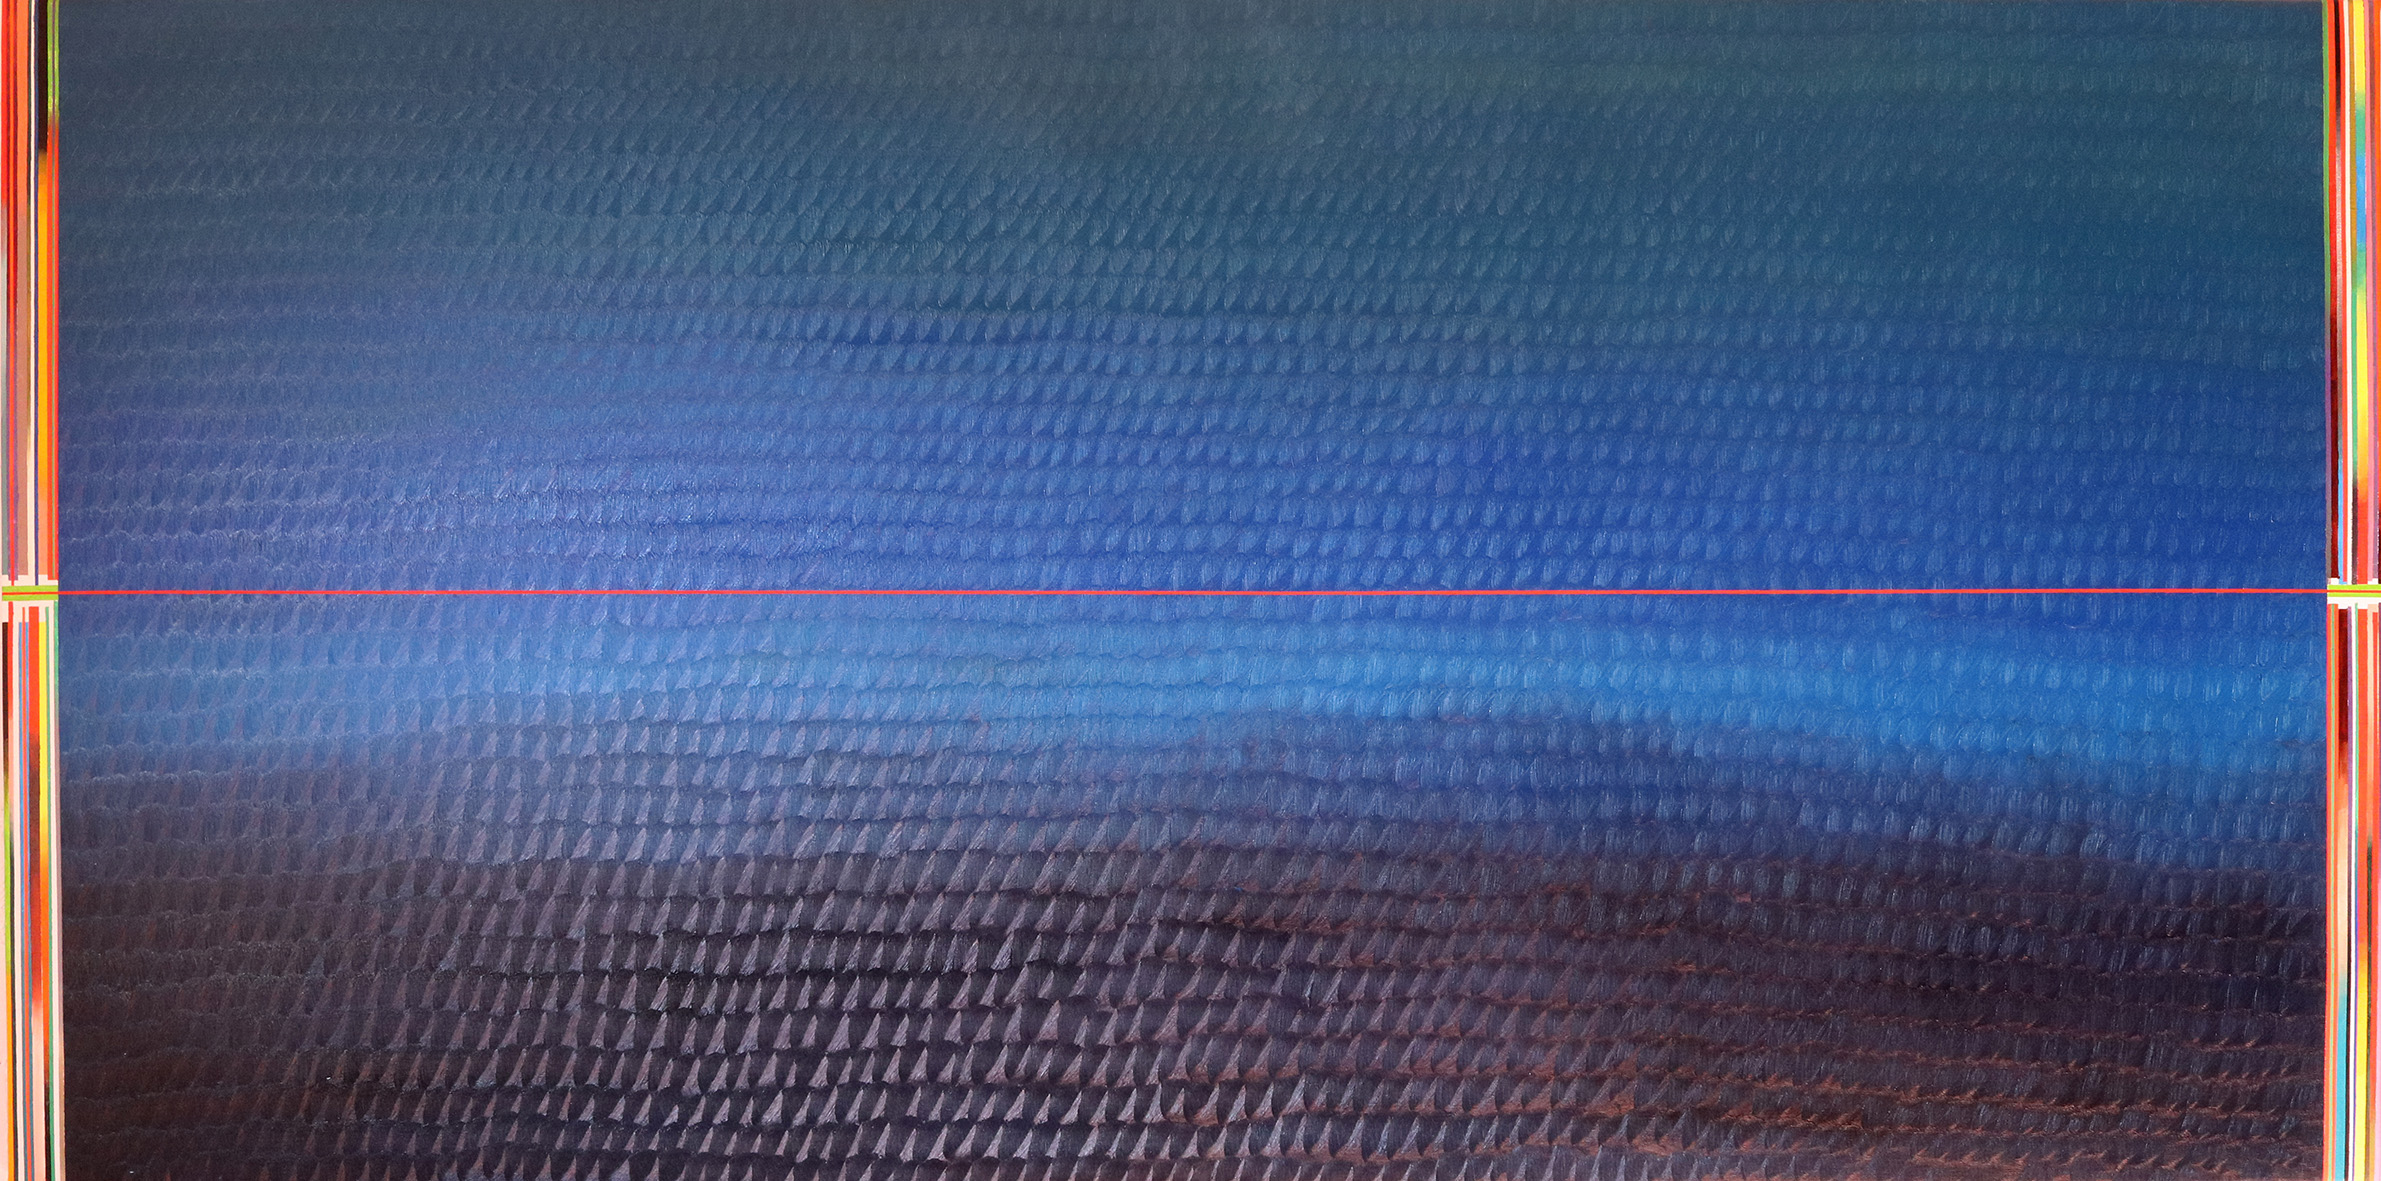 Redline horizon (v 7.0) (100x200cm) 2019 (private collection, New York)